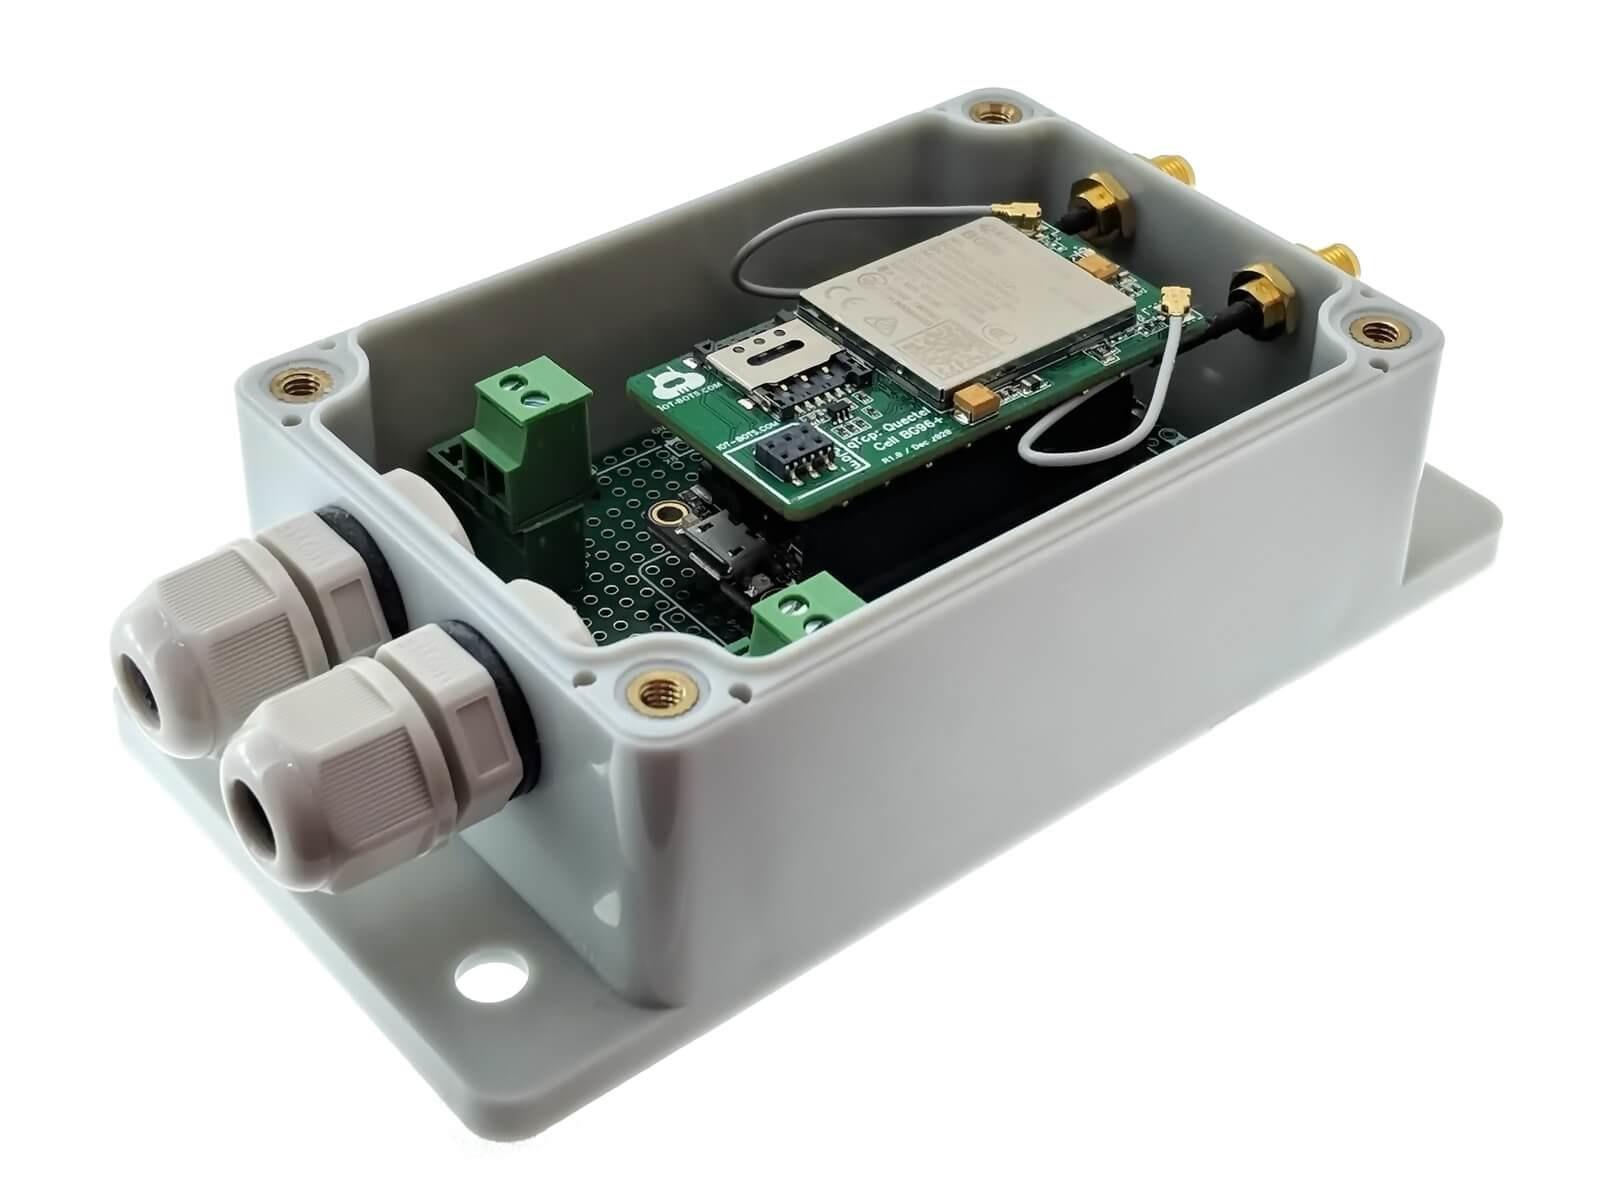 iotbotscom-qtop-cell-quectel-bg96-afc-qbox-iot-kit